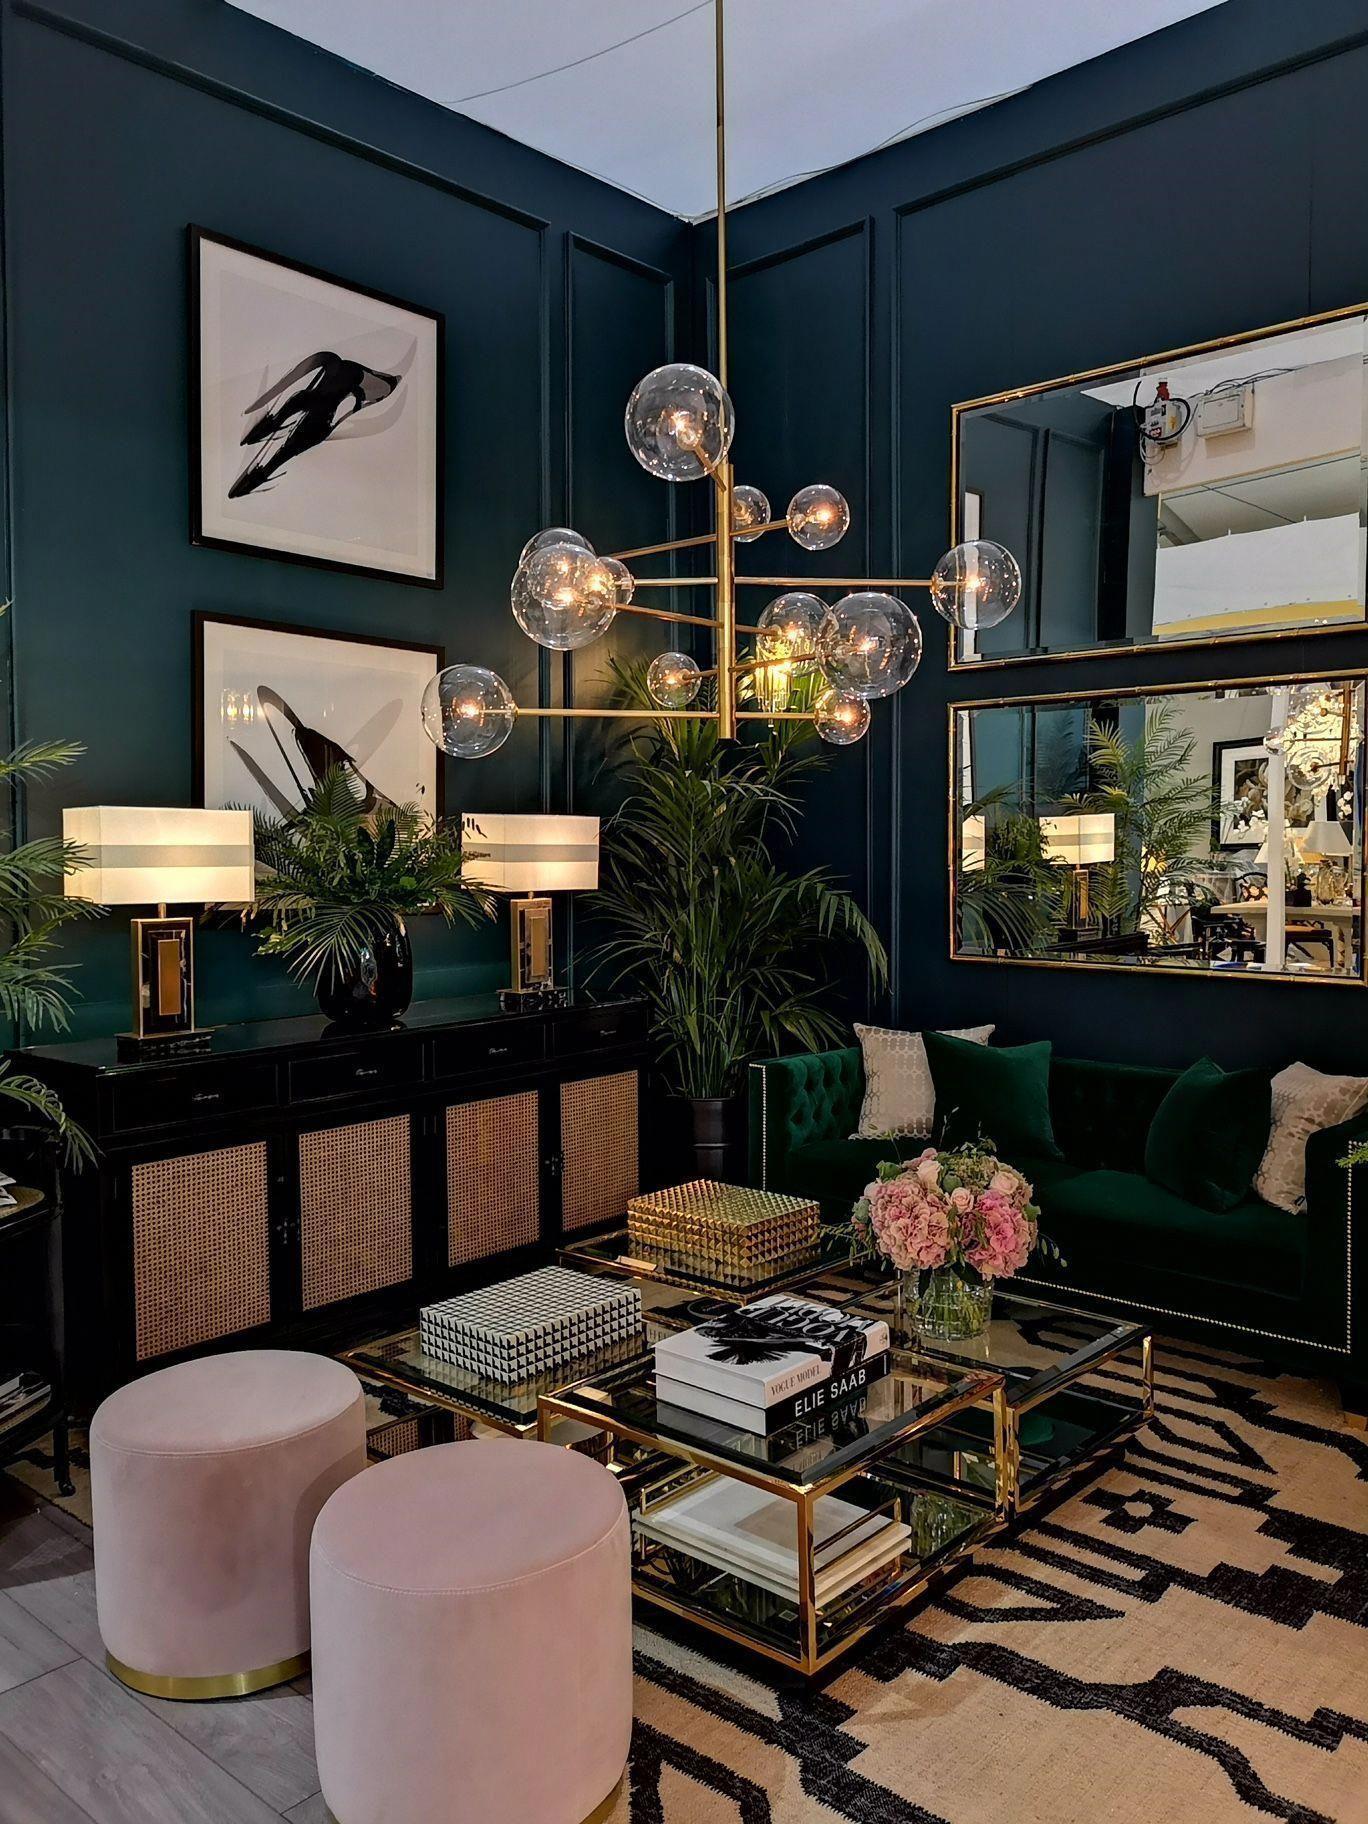 pinterest modern home decor – ksa g.com